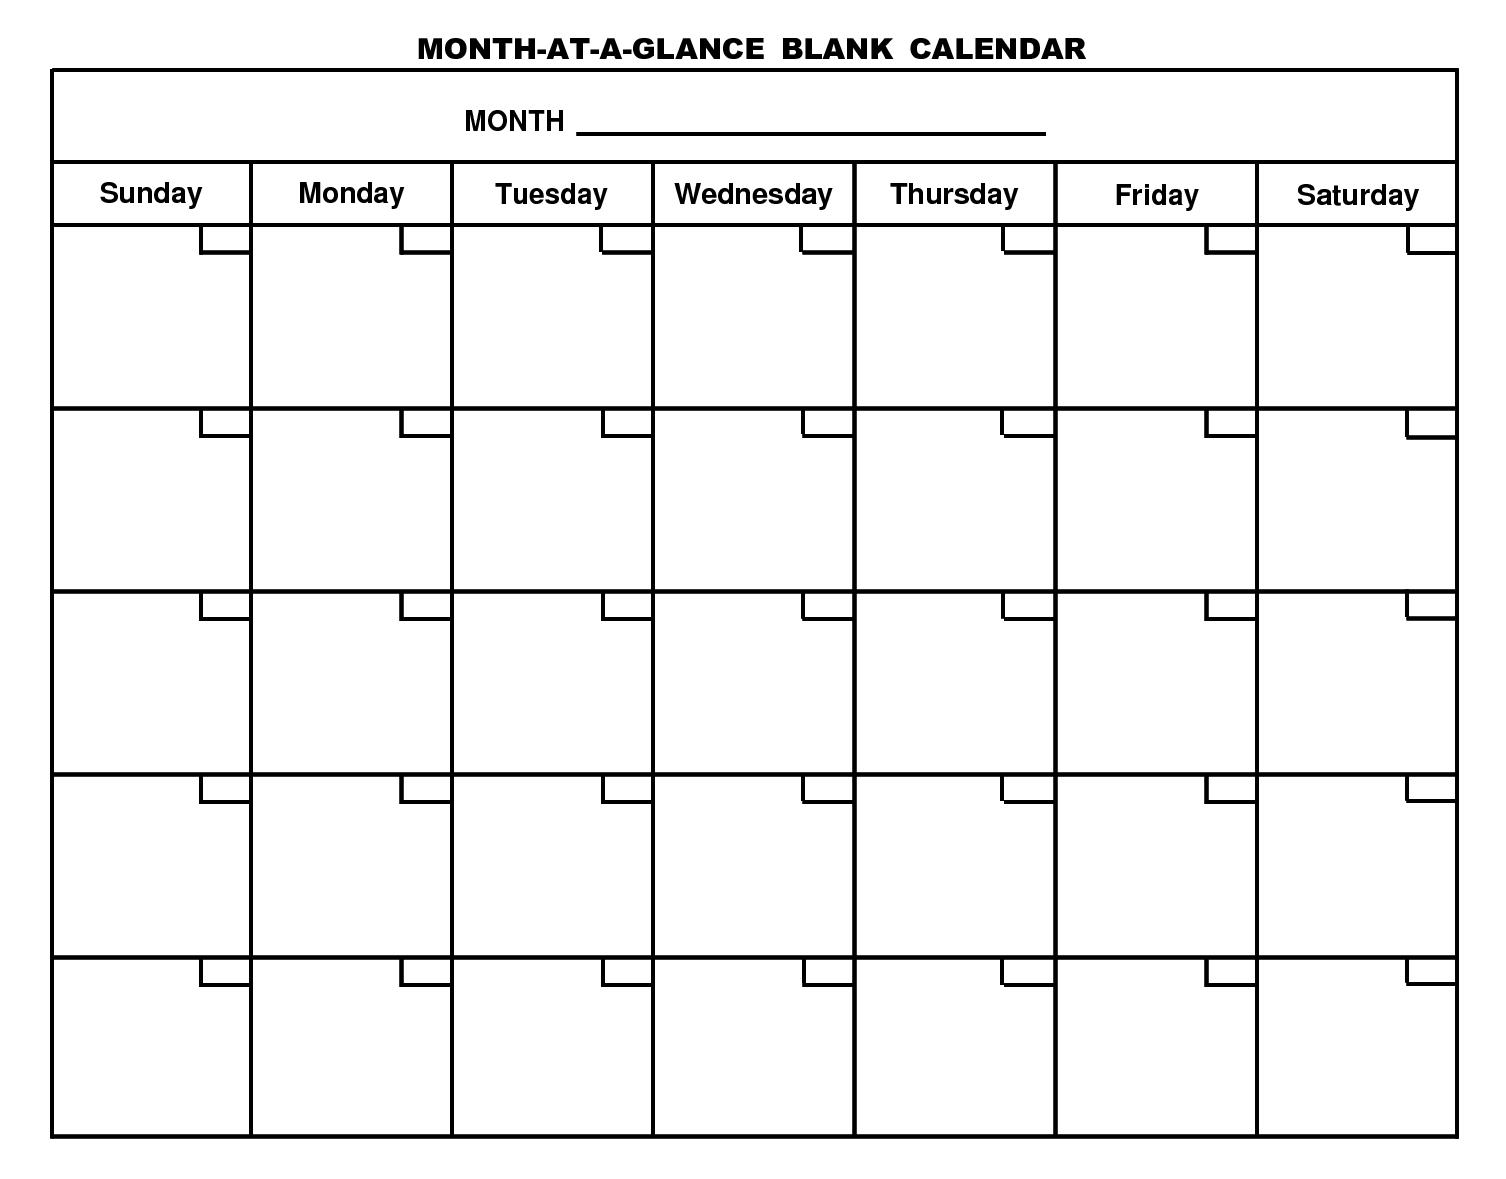 Printable Blank Calendar Template … | Printable Blank-Printable Monthly Calendar Sunday To Saturday No Dates